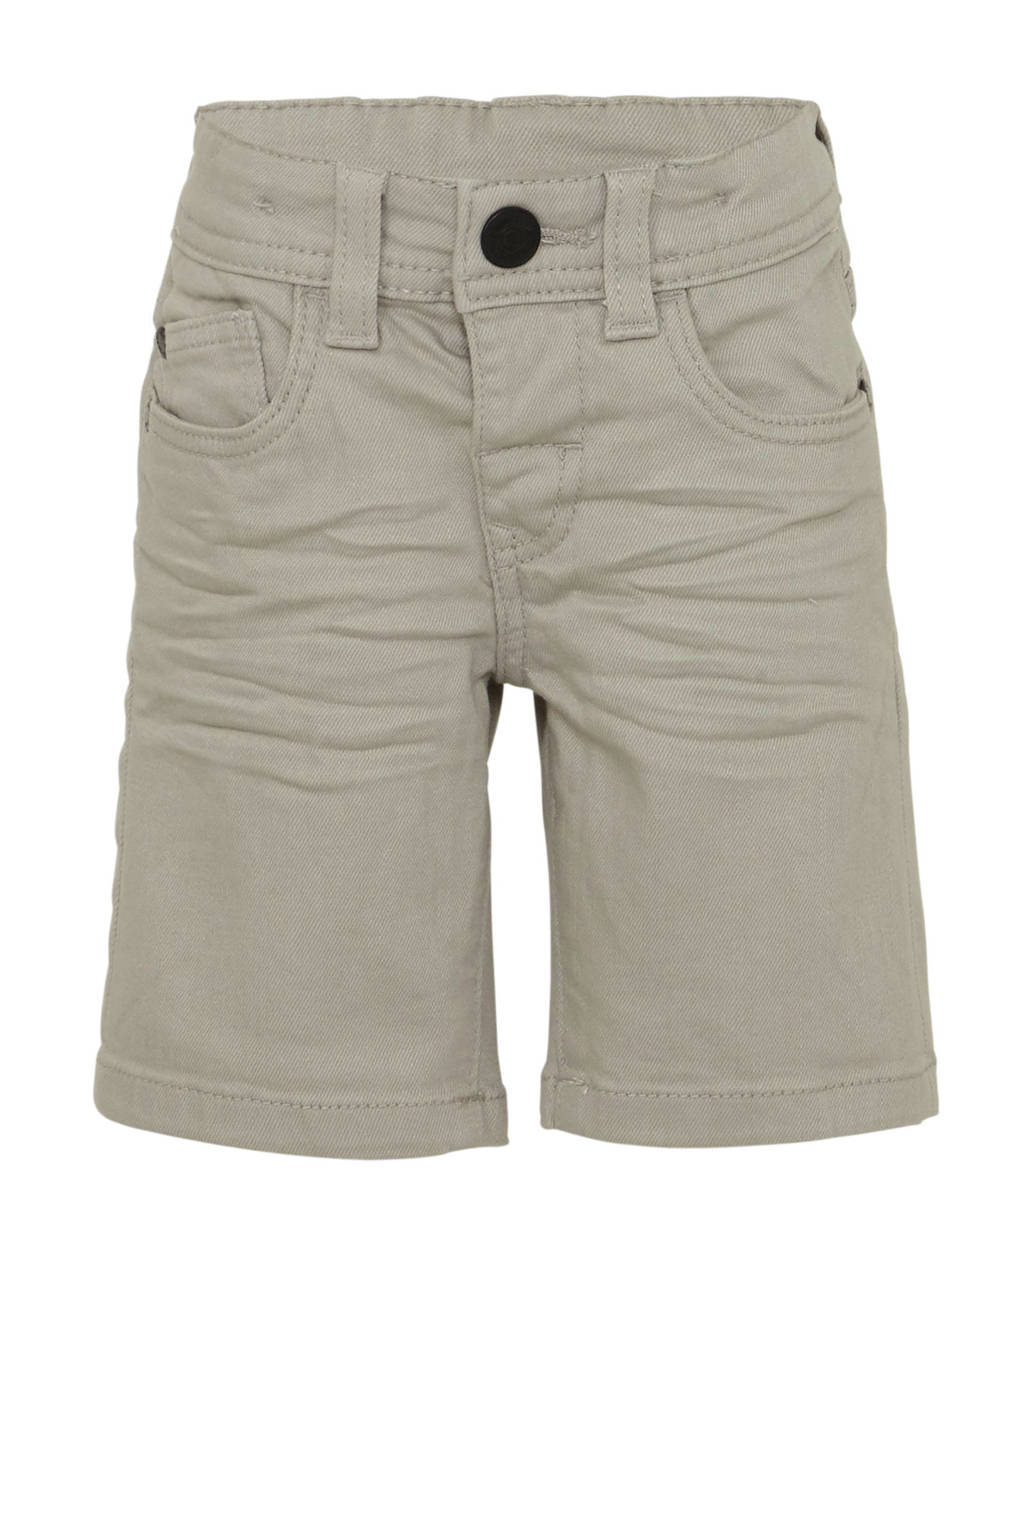 C&A Palomino slim fit short beige, Beige